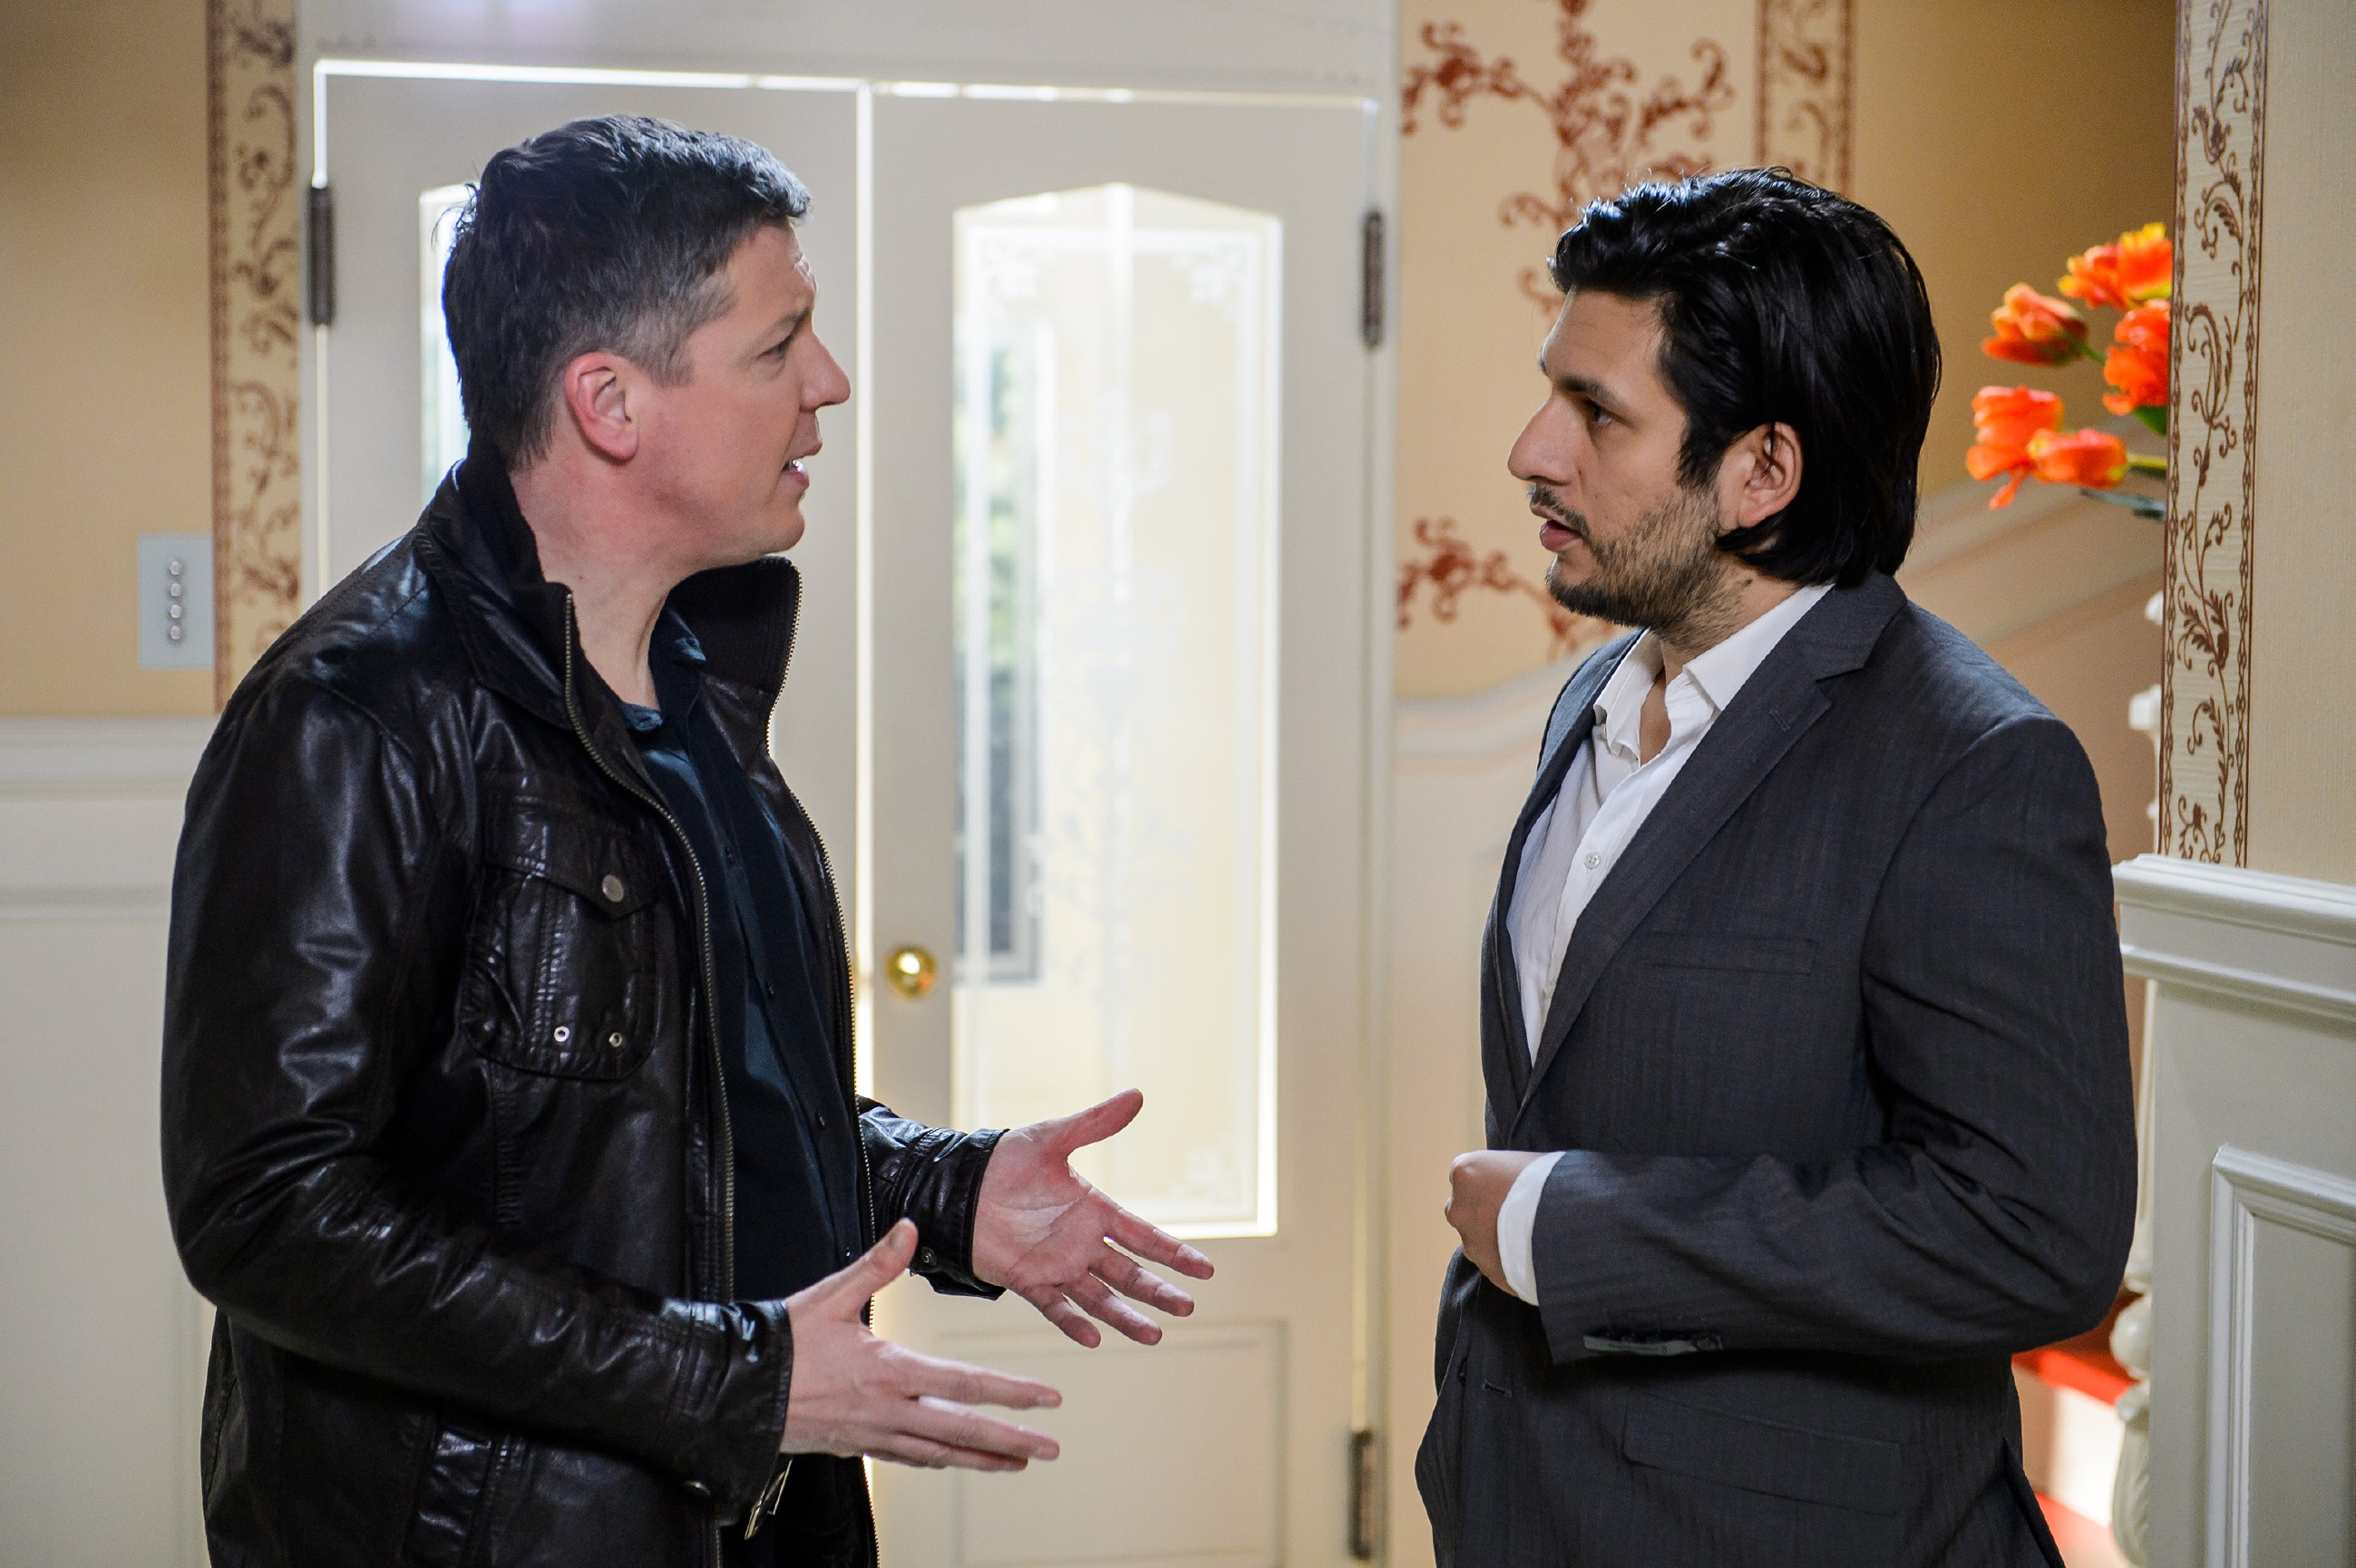 Maximilian (Francisco Medina, r.) kämpft verzweifelt bei Kommissar Hohnert (Markus Haase) um Aufschub. (Quelle: RTL / Willi Weber)